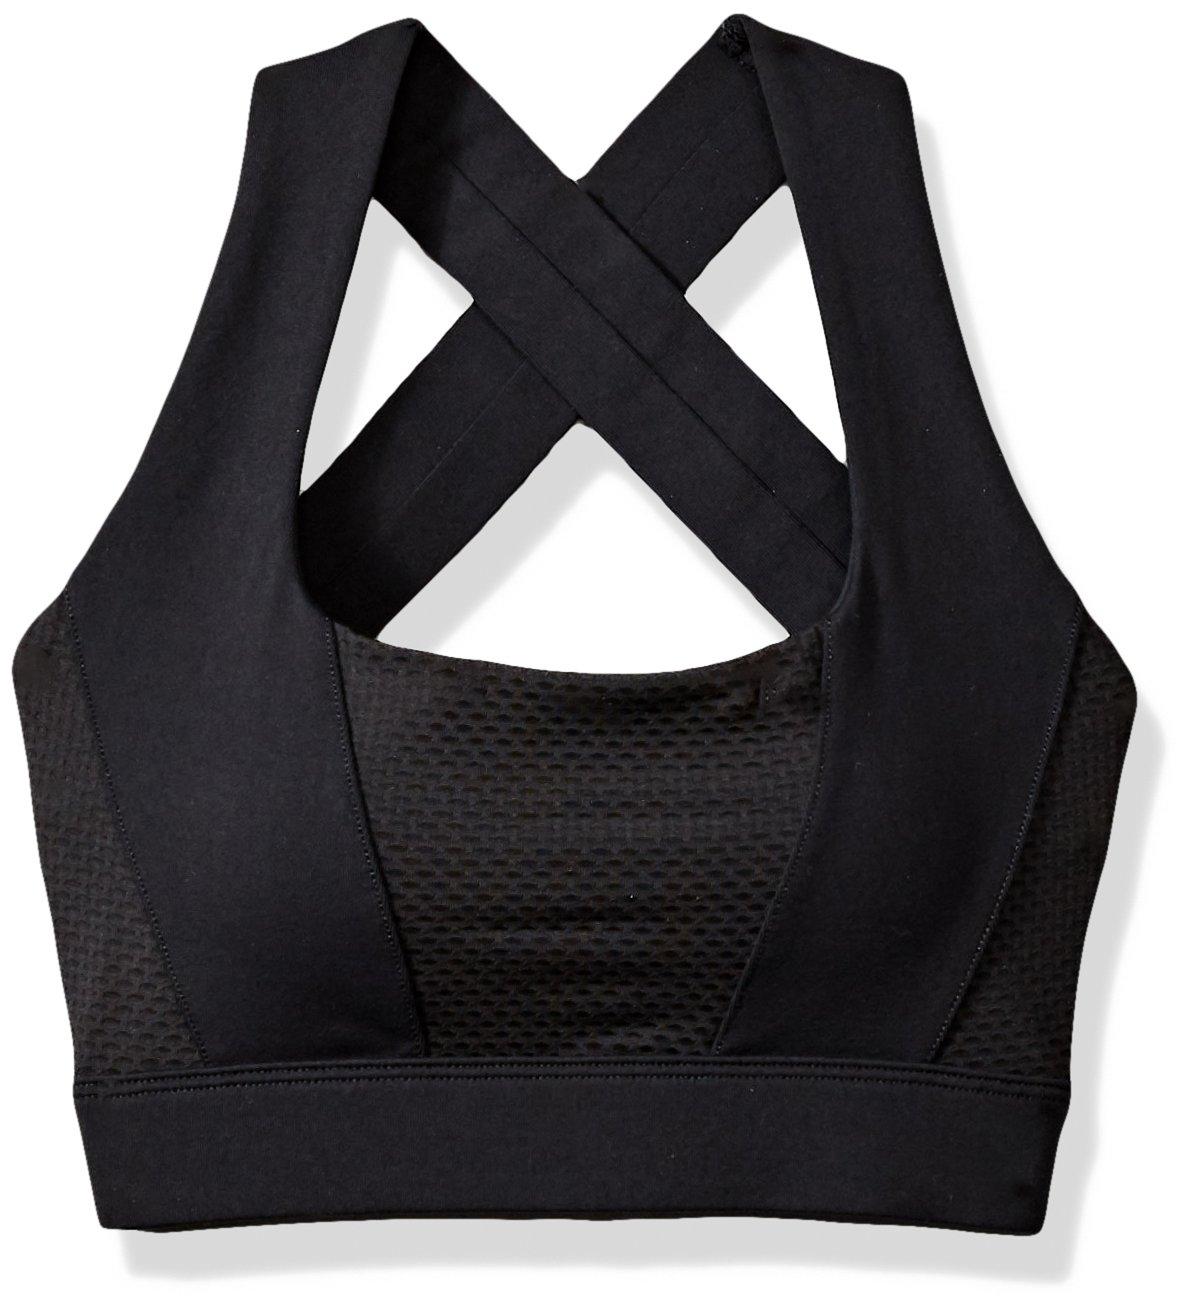 (X-Large, Black) - Lorna Jane E0060 Women's Sports Bra, women's, E0060   B077JR8551